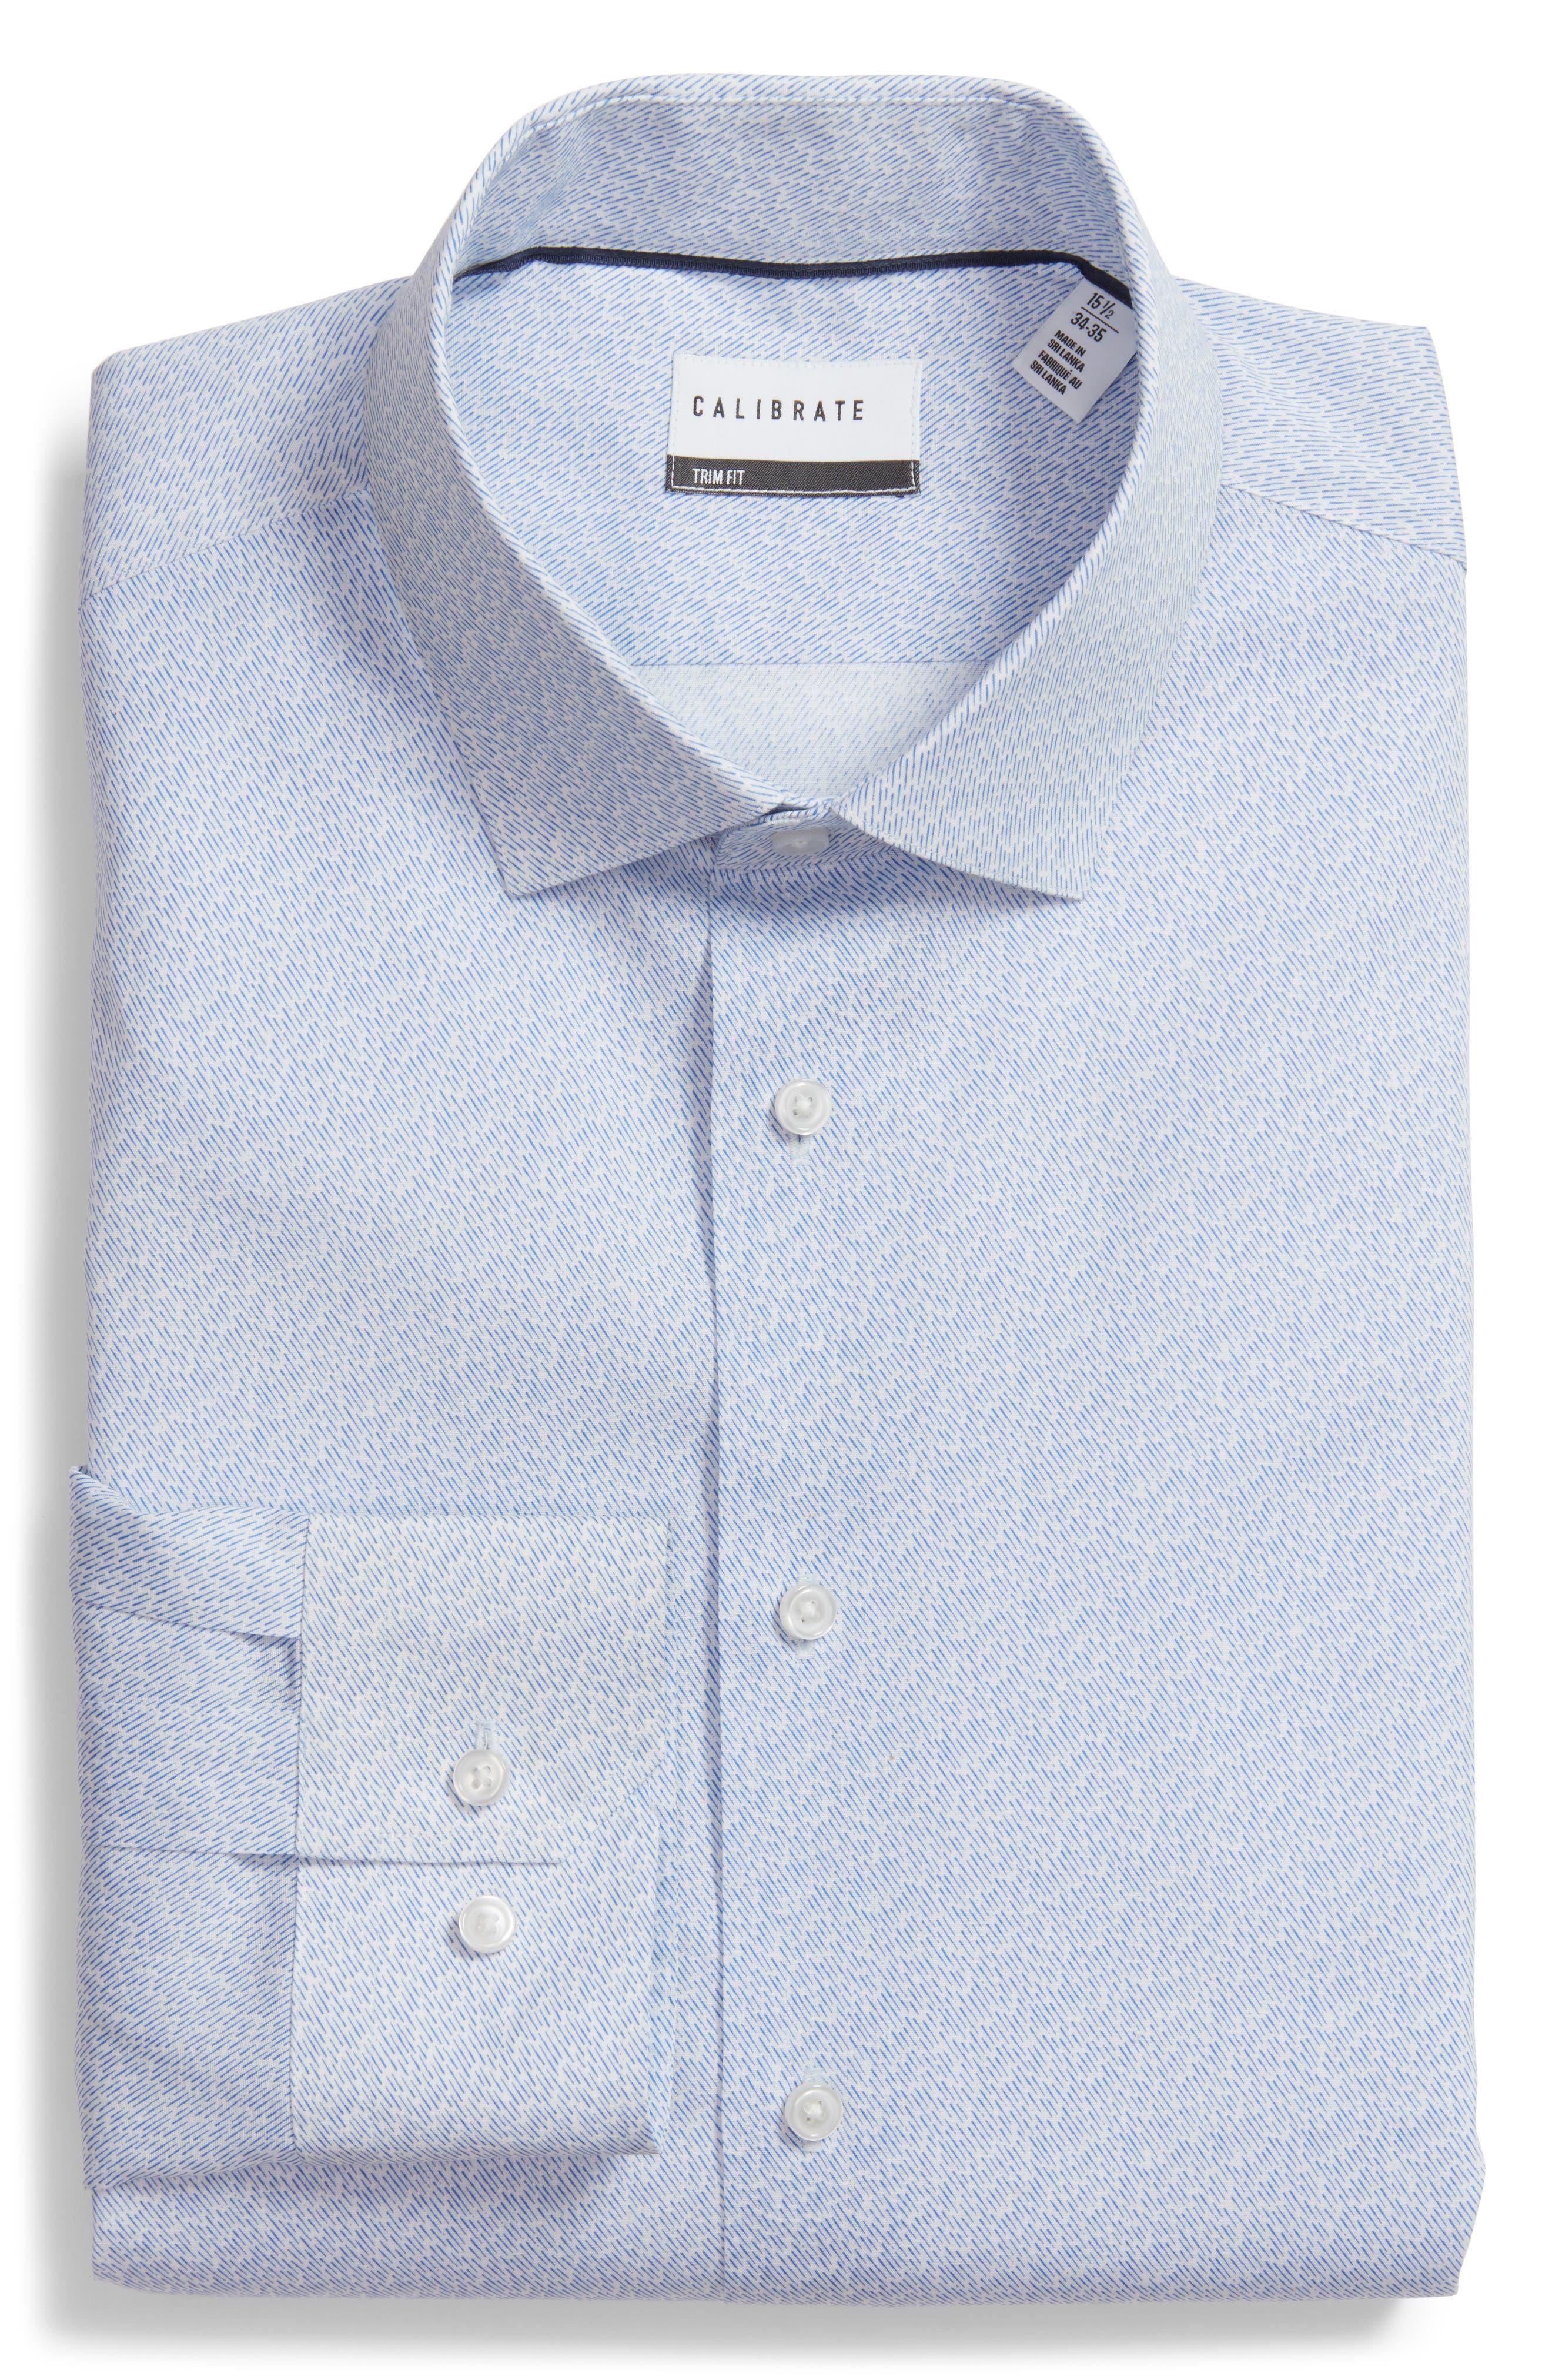 Trim Fit Print Dress Shirt,                             Main thumbnail 1, color,                             450